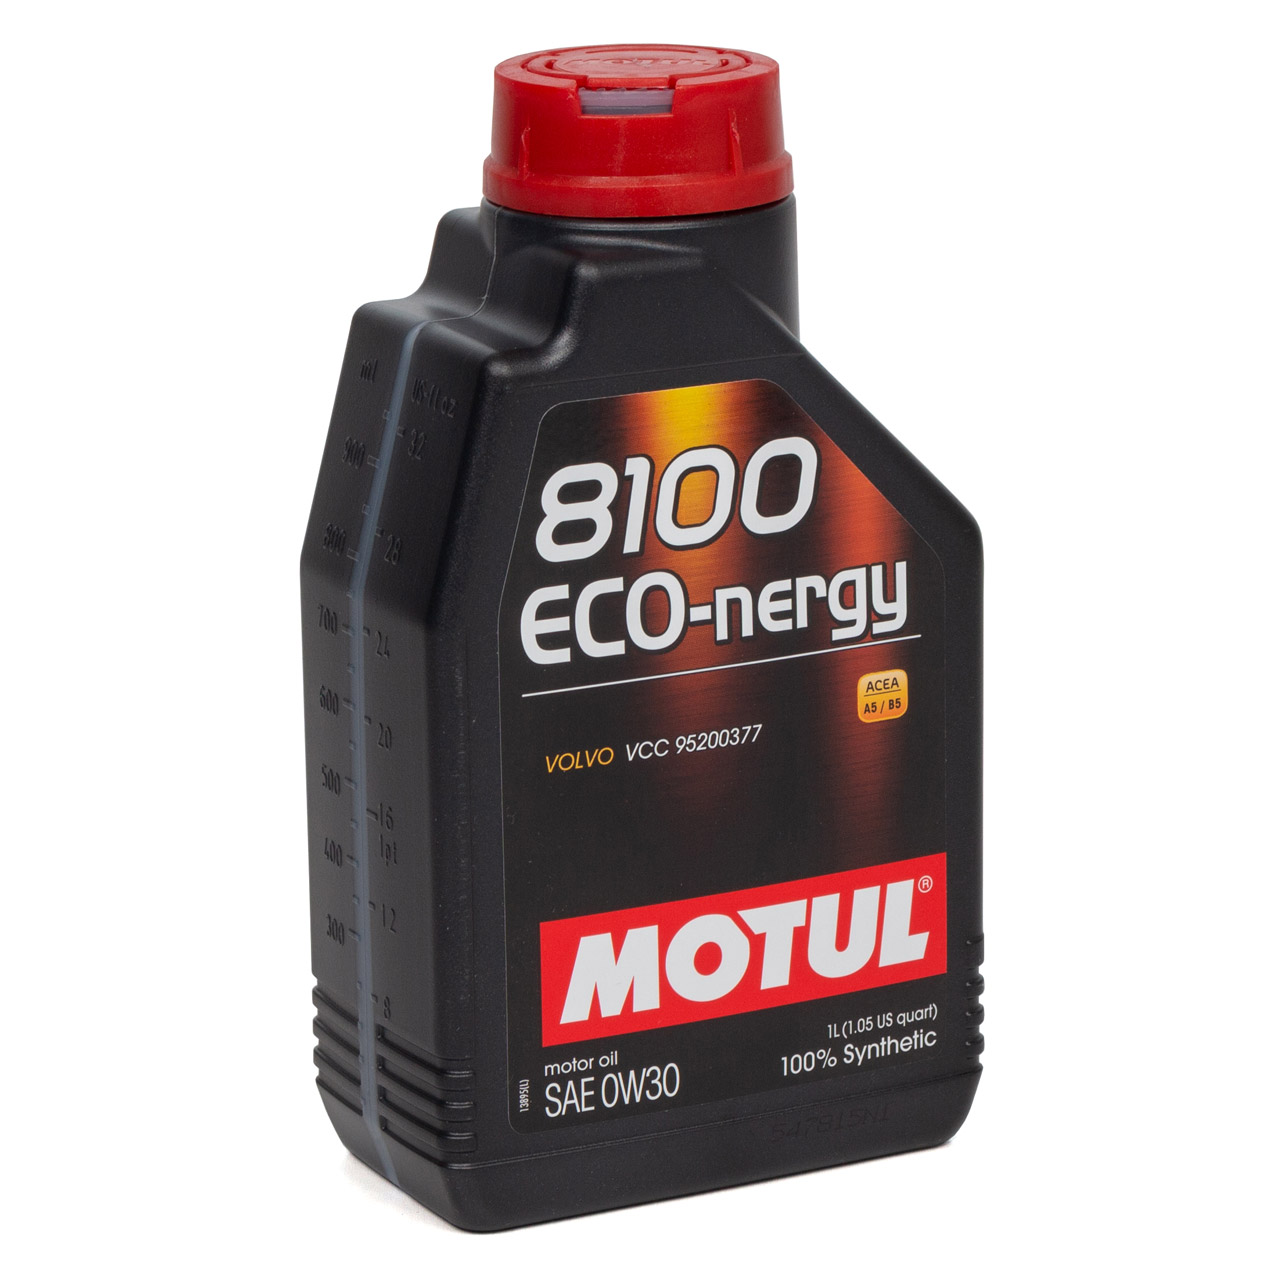 MOTUL 8100 ECO-nergy Motoröl Öl 0W30 ACEA A5/B5 VOLVO VCC95200377 - 6L 6 Liter